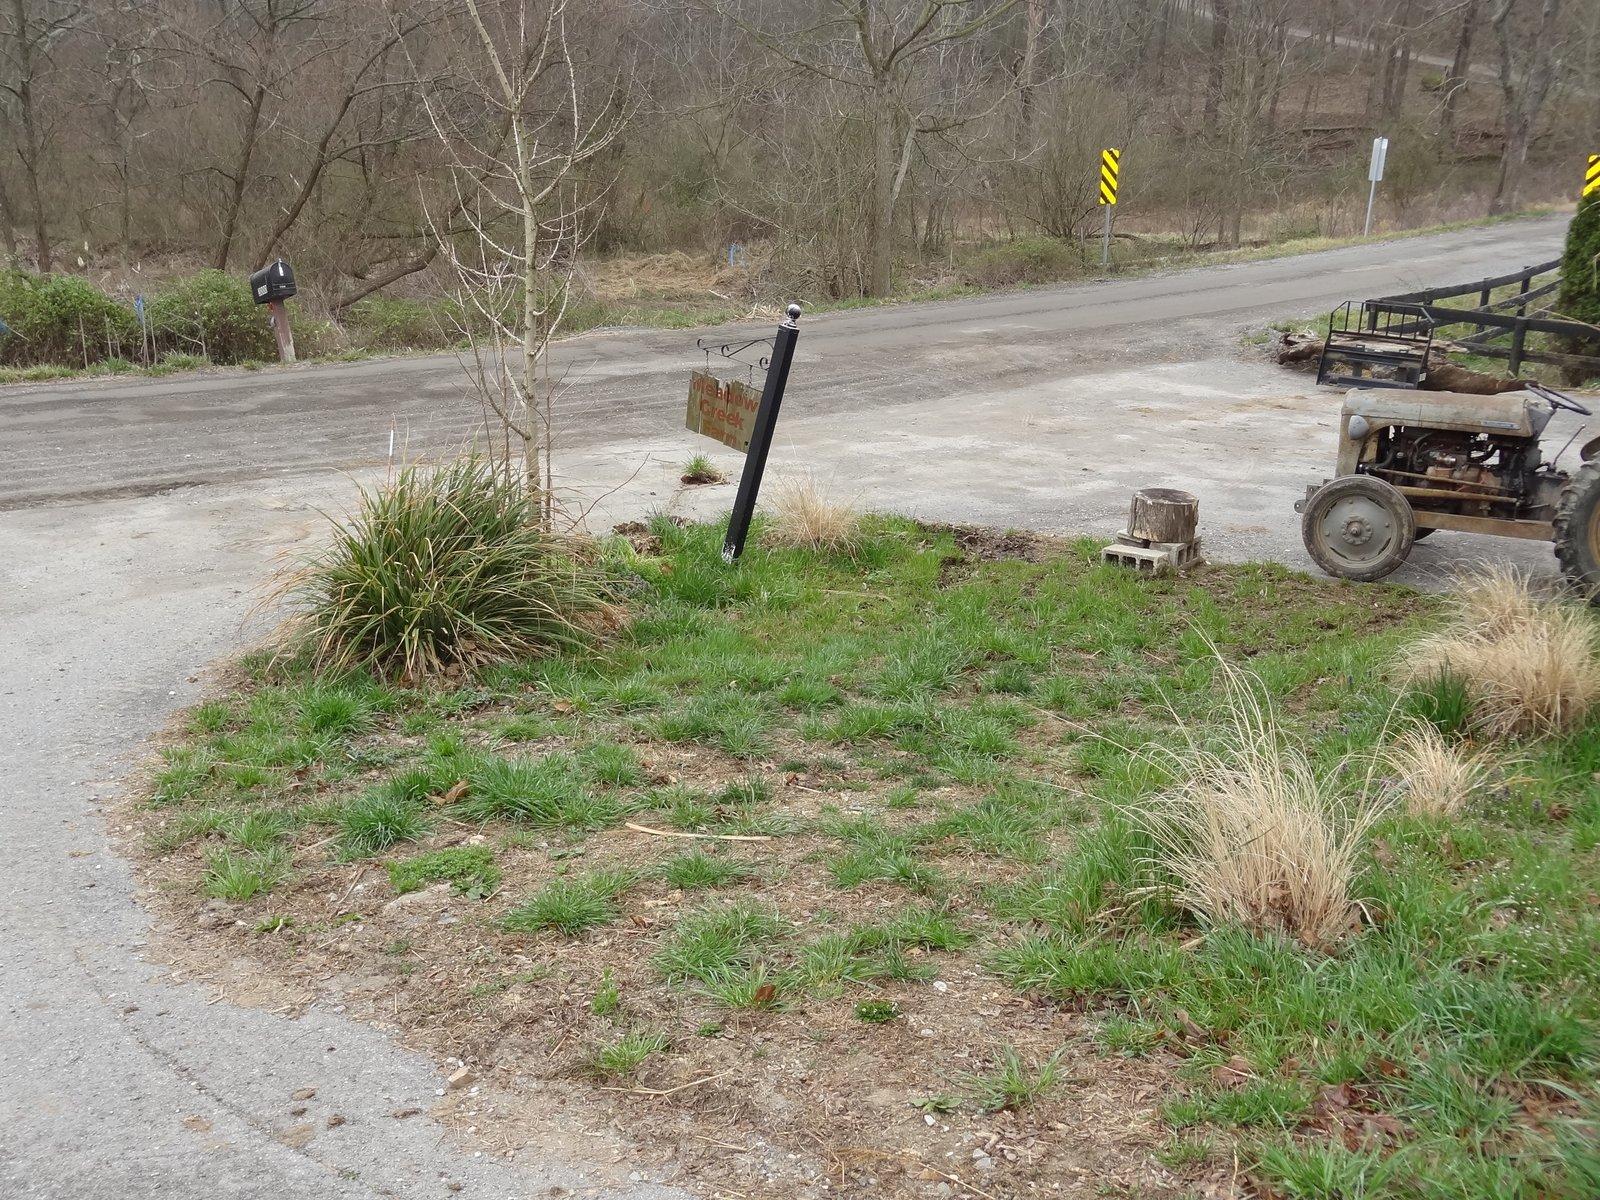 Meadow Creek Farm A New Sign For Meadow Creek Farm Part 1